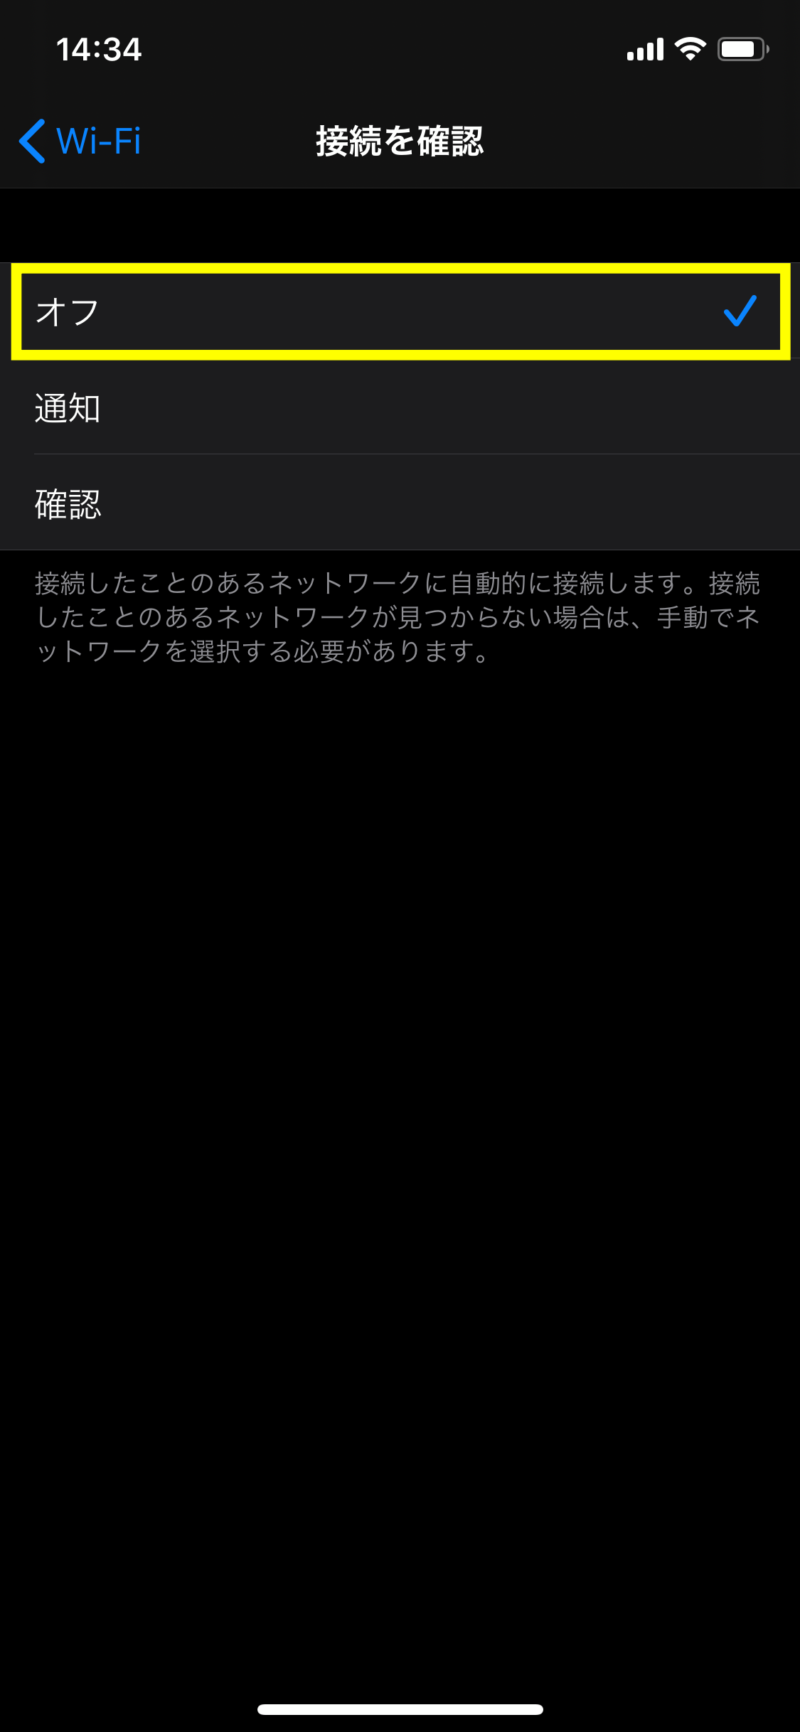 iPhoneでWi-Fi接続確認をオフにする方法3